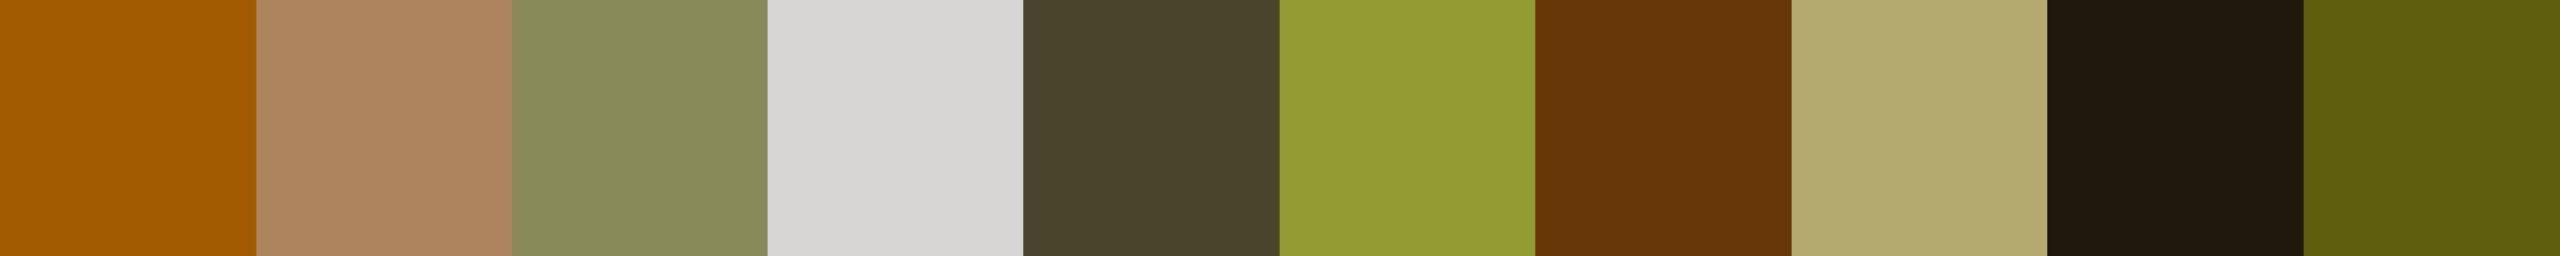 487 Celeboo Color Palette